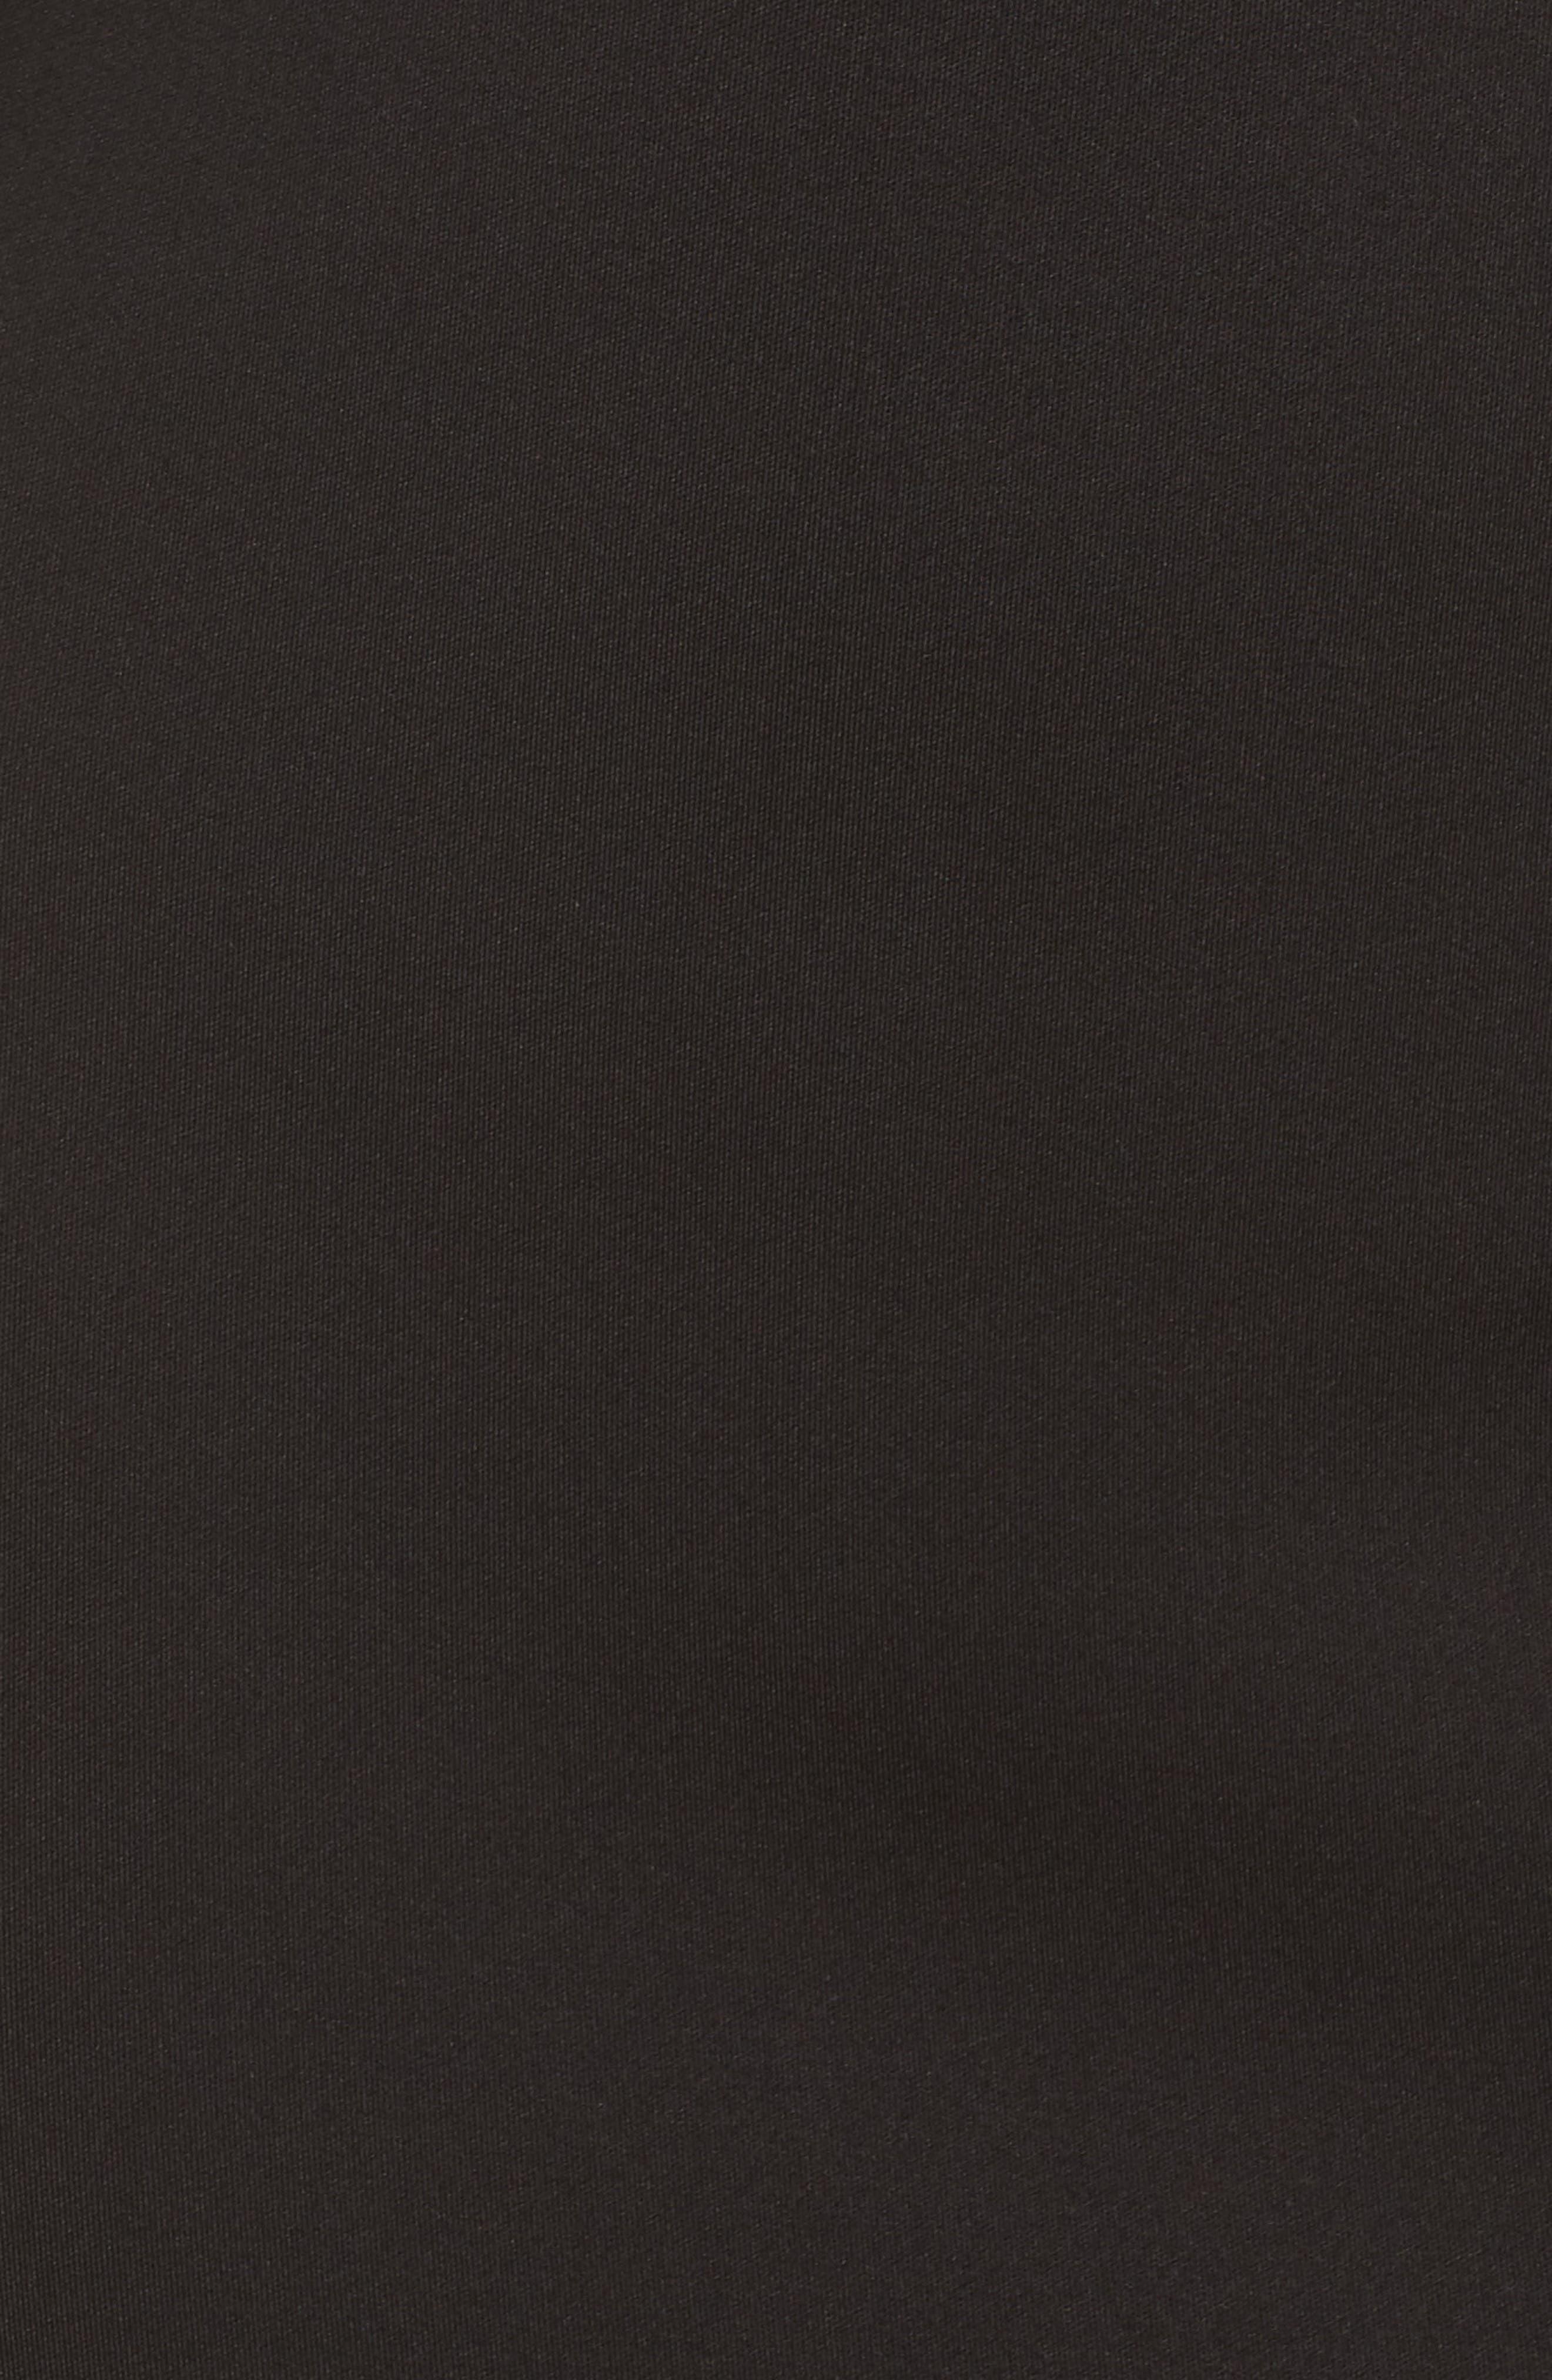 Cowl Neck Mermaid Gown,                             Alternate thumbnail 6, color,                             BLACK